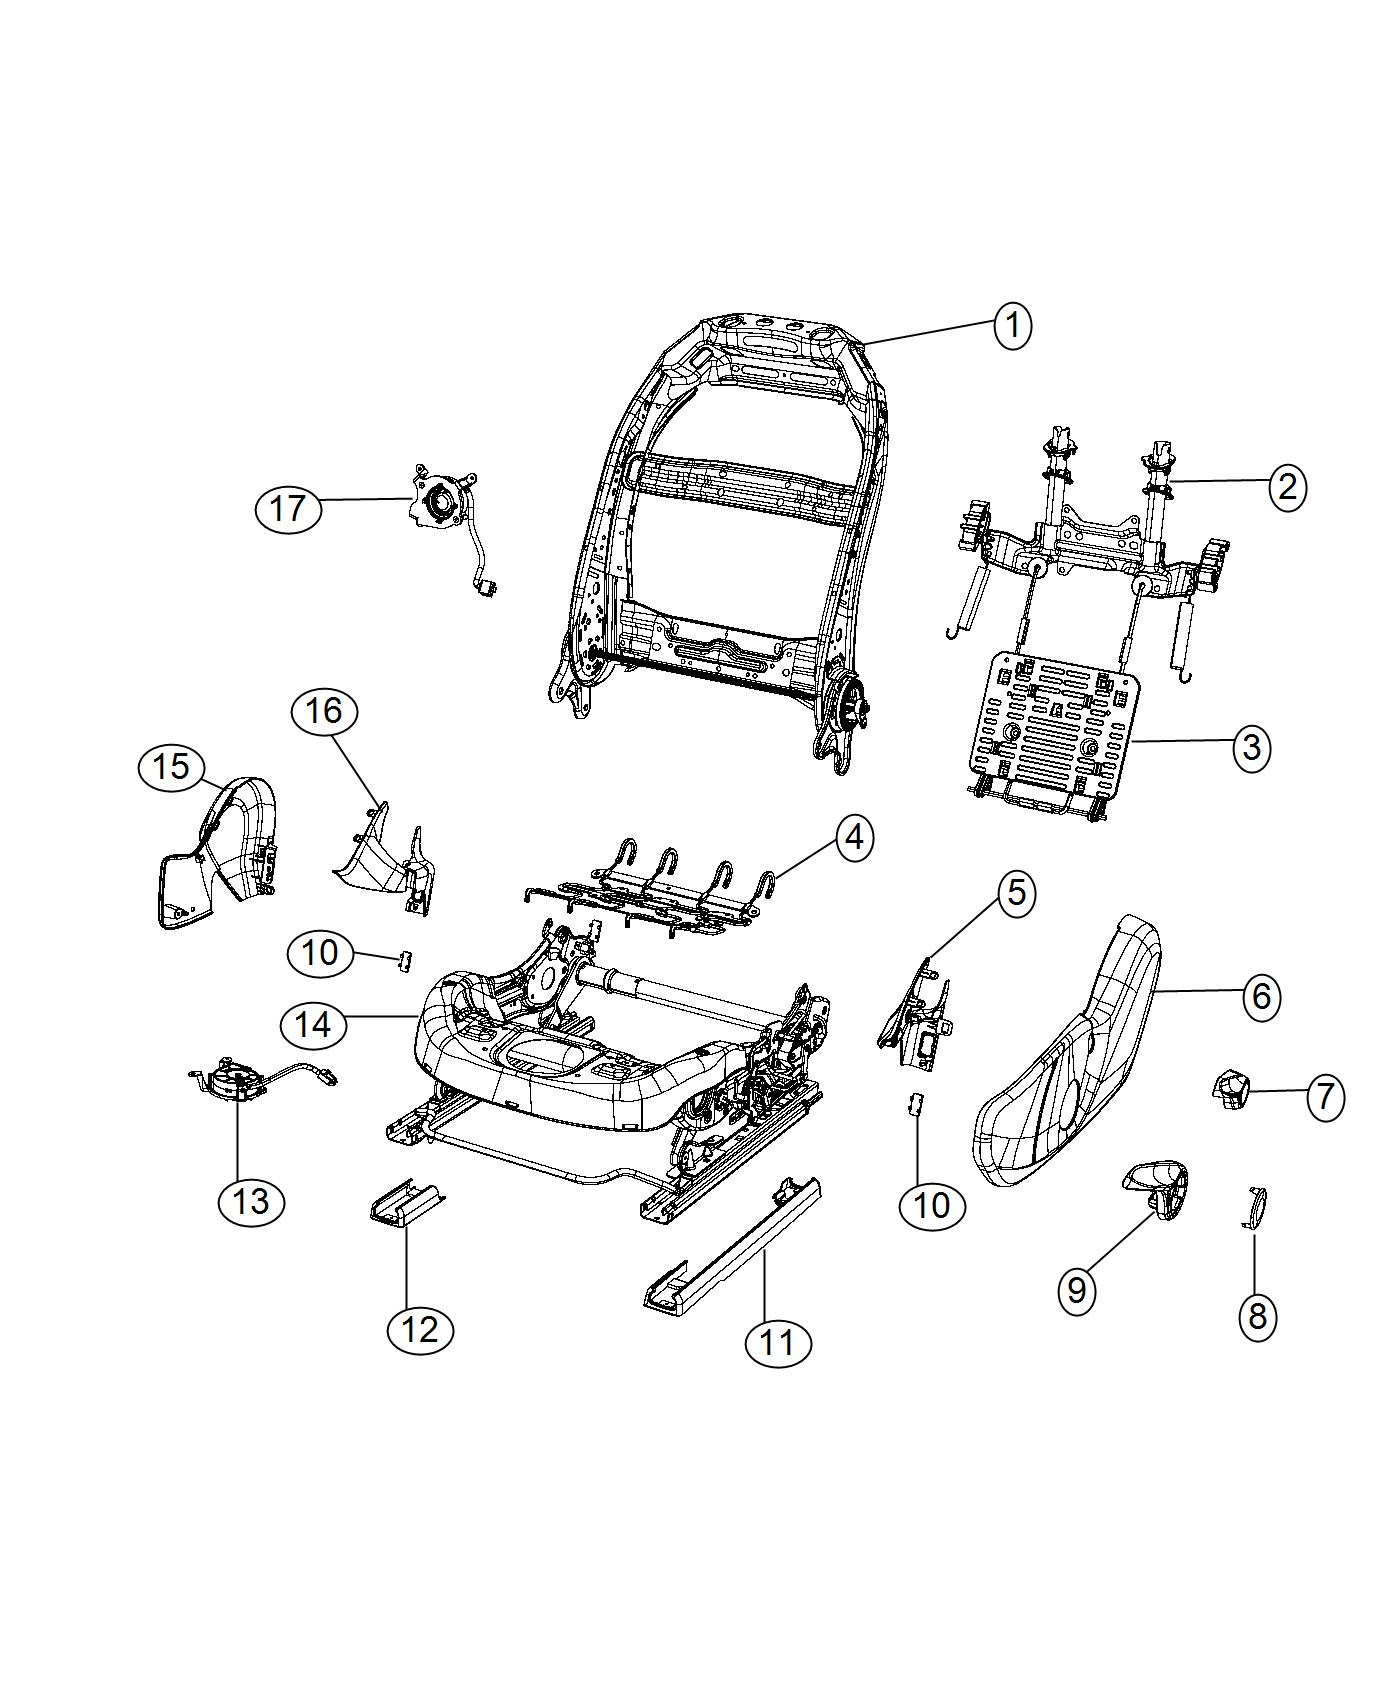 2016 Chrysler 200 Shield. Seat. [black/diesel gray], [-x9